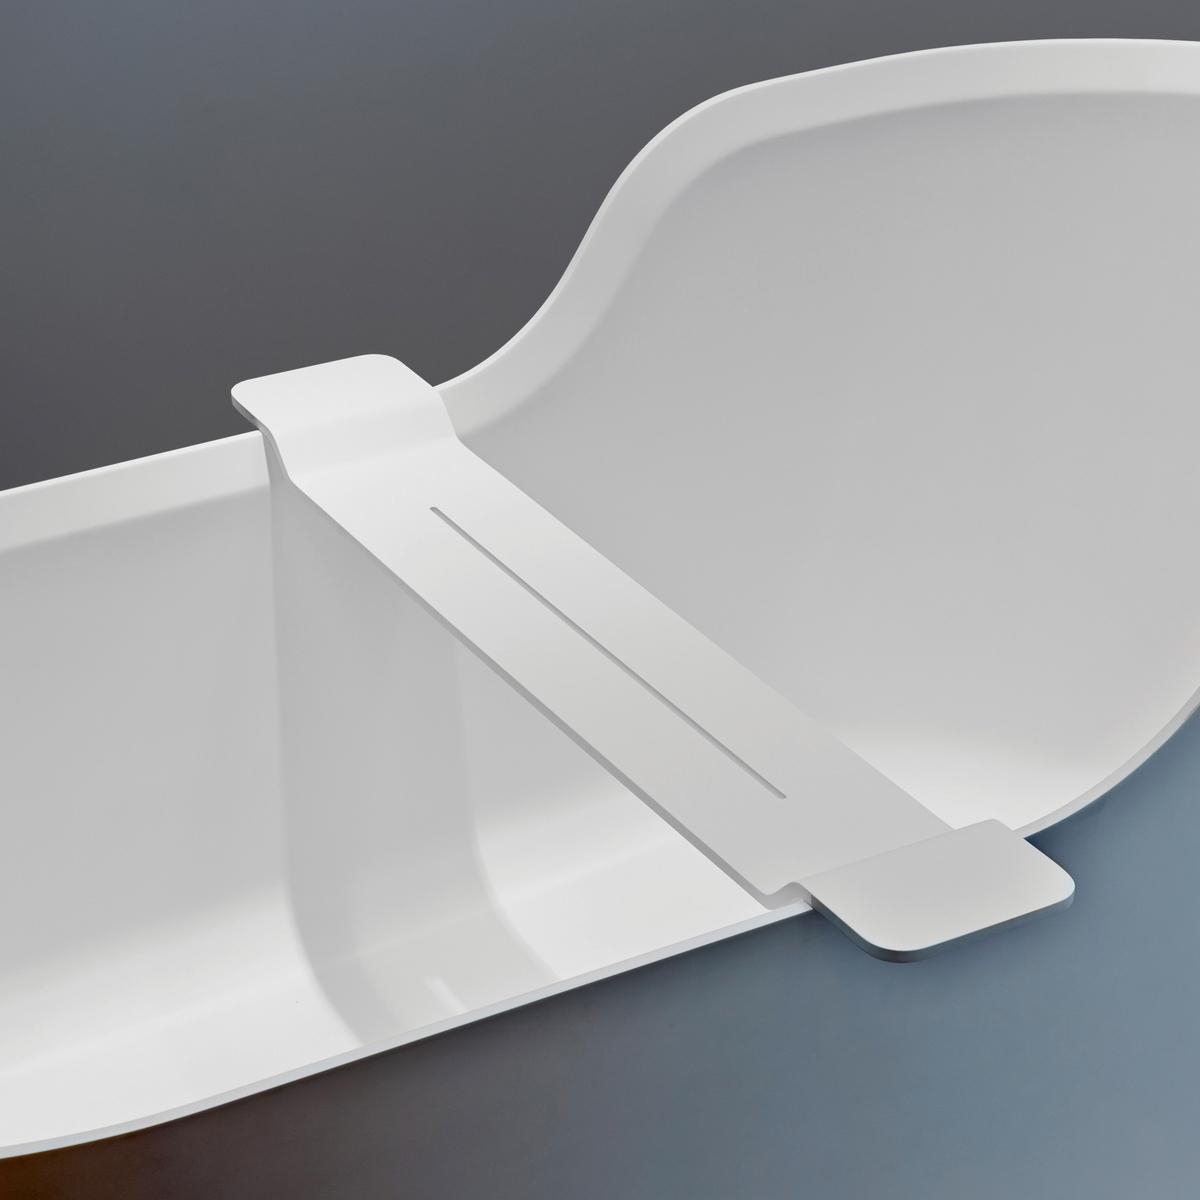 Decor walther stone bath tray for Decorative bathroom tray